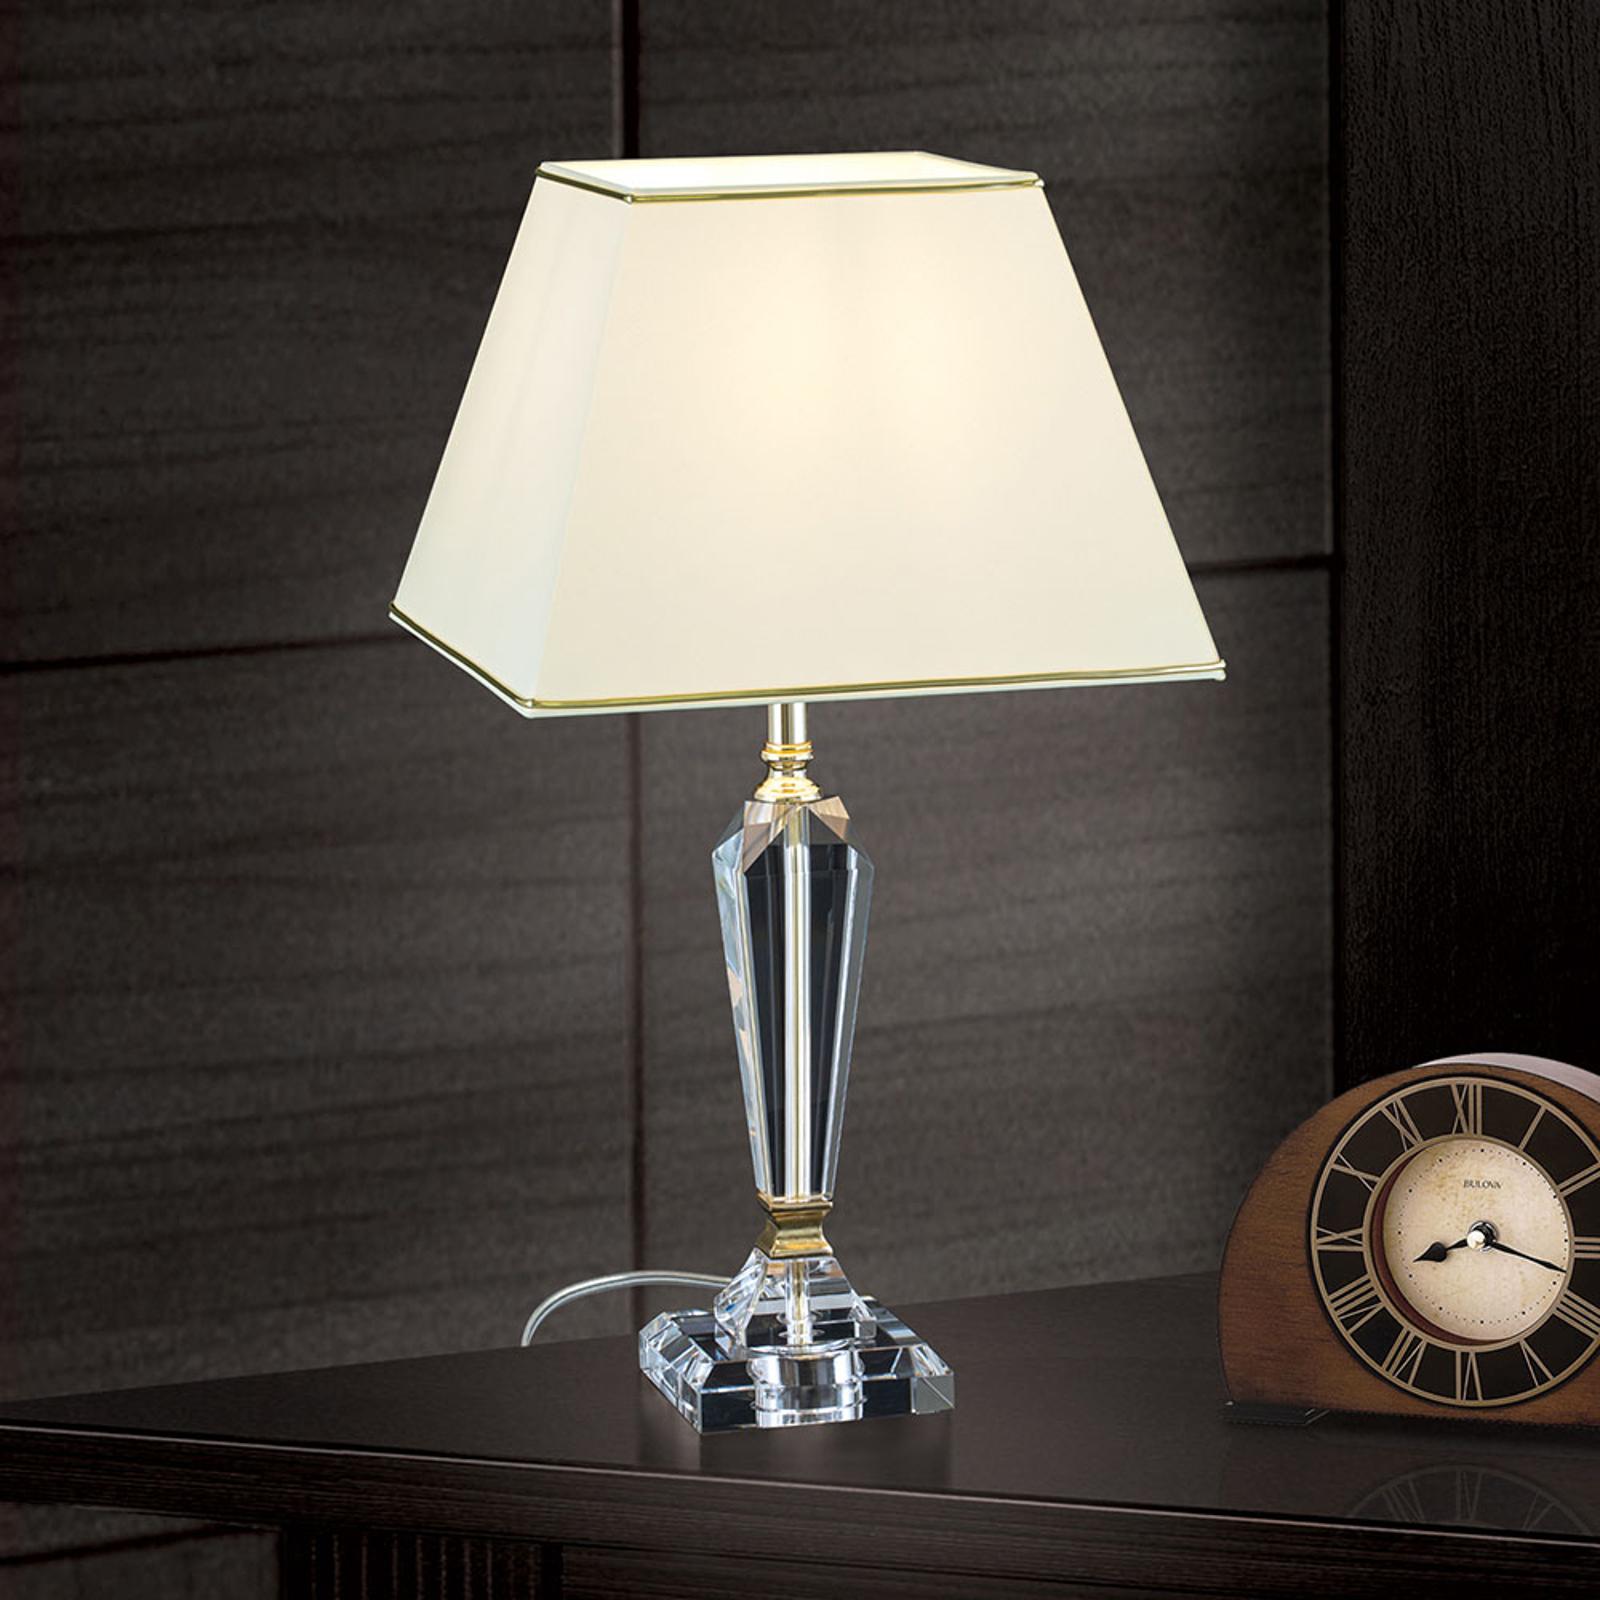 Tafellamp Veronique, voet smal, crème/goud